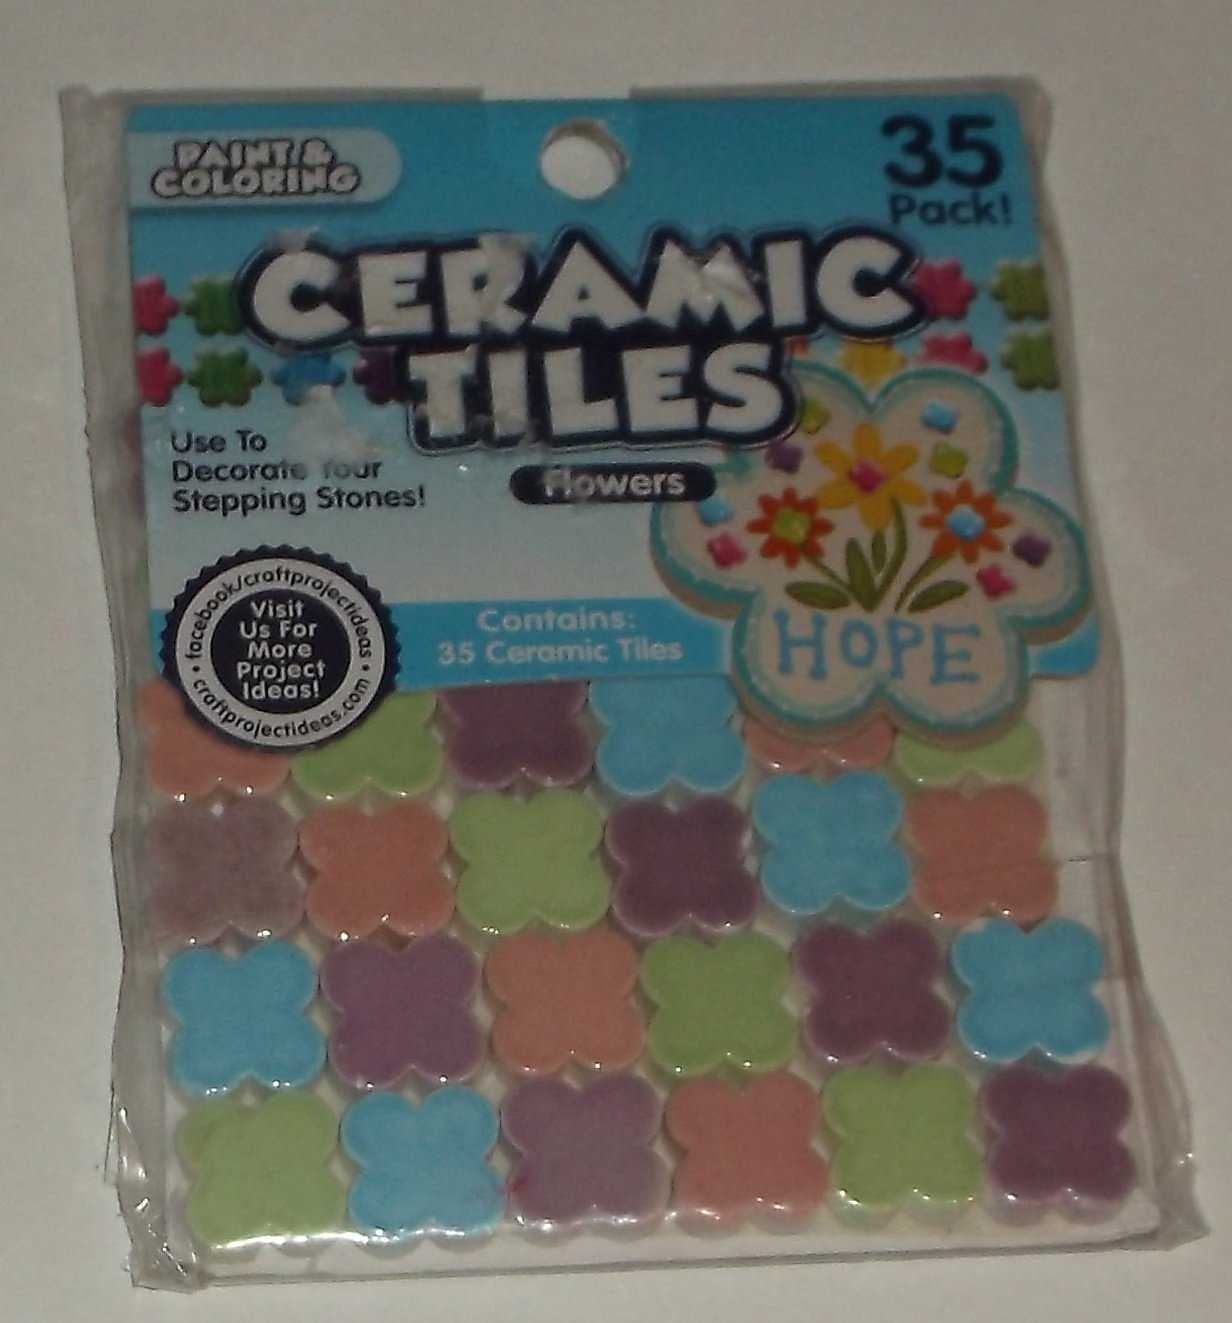 Mosaic Flower Ceramic Tiles, 35-Pack, Multi-Color